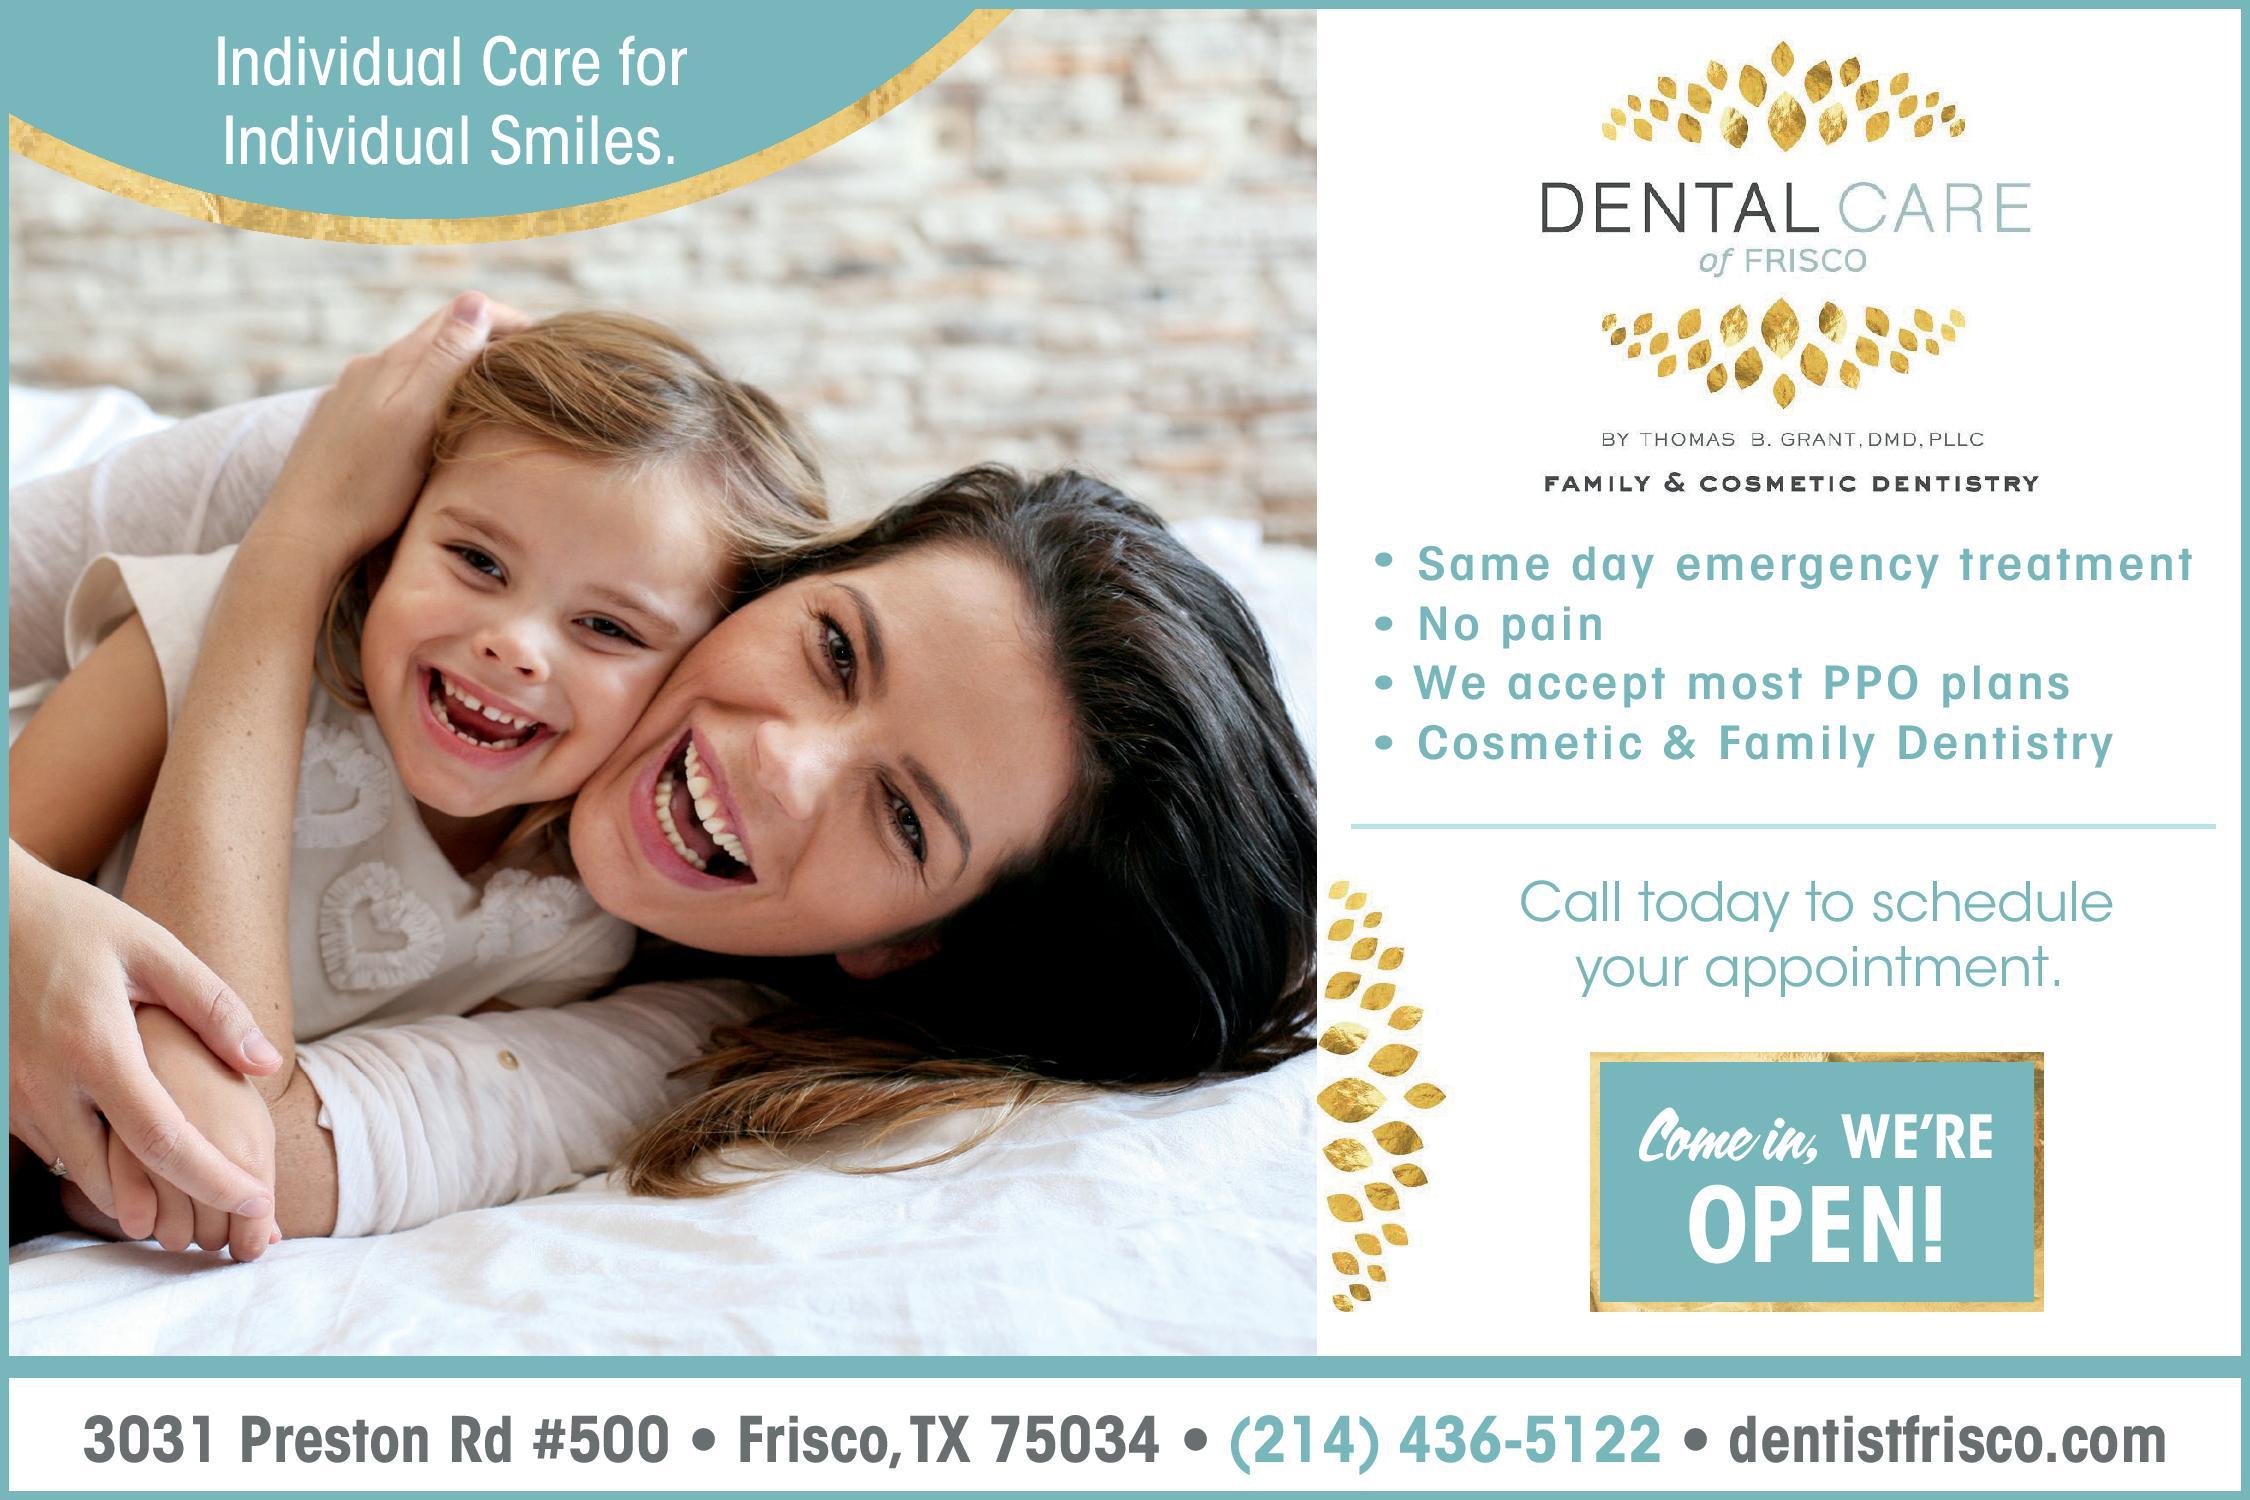 Dentist_Half_1-page-001